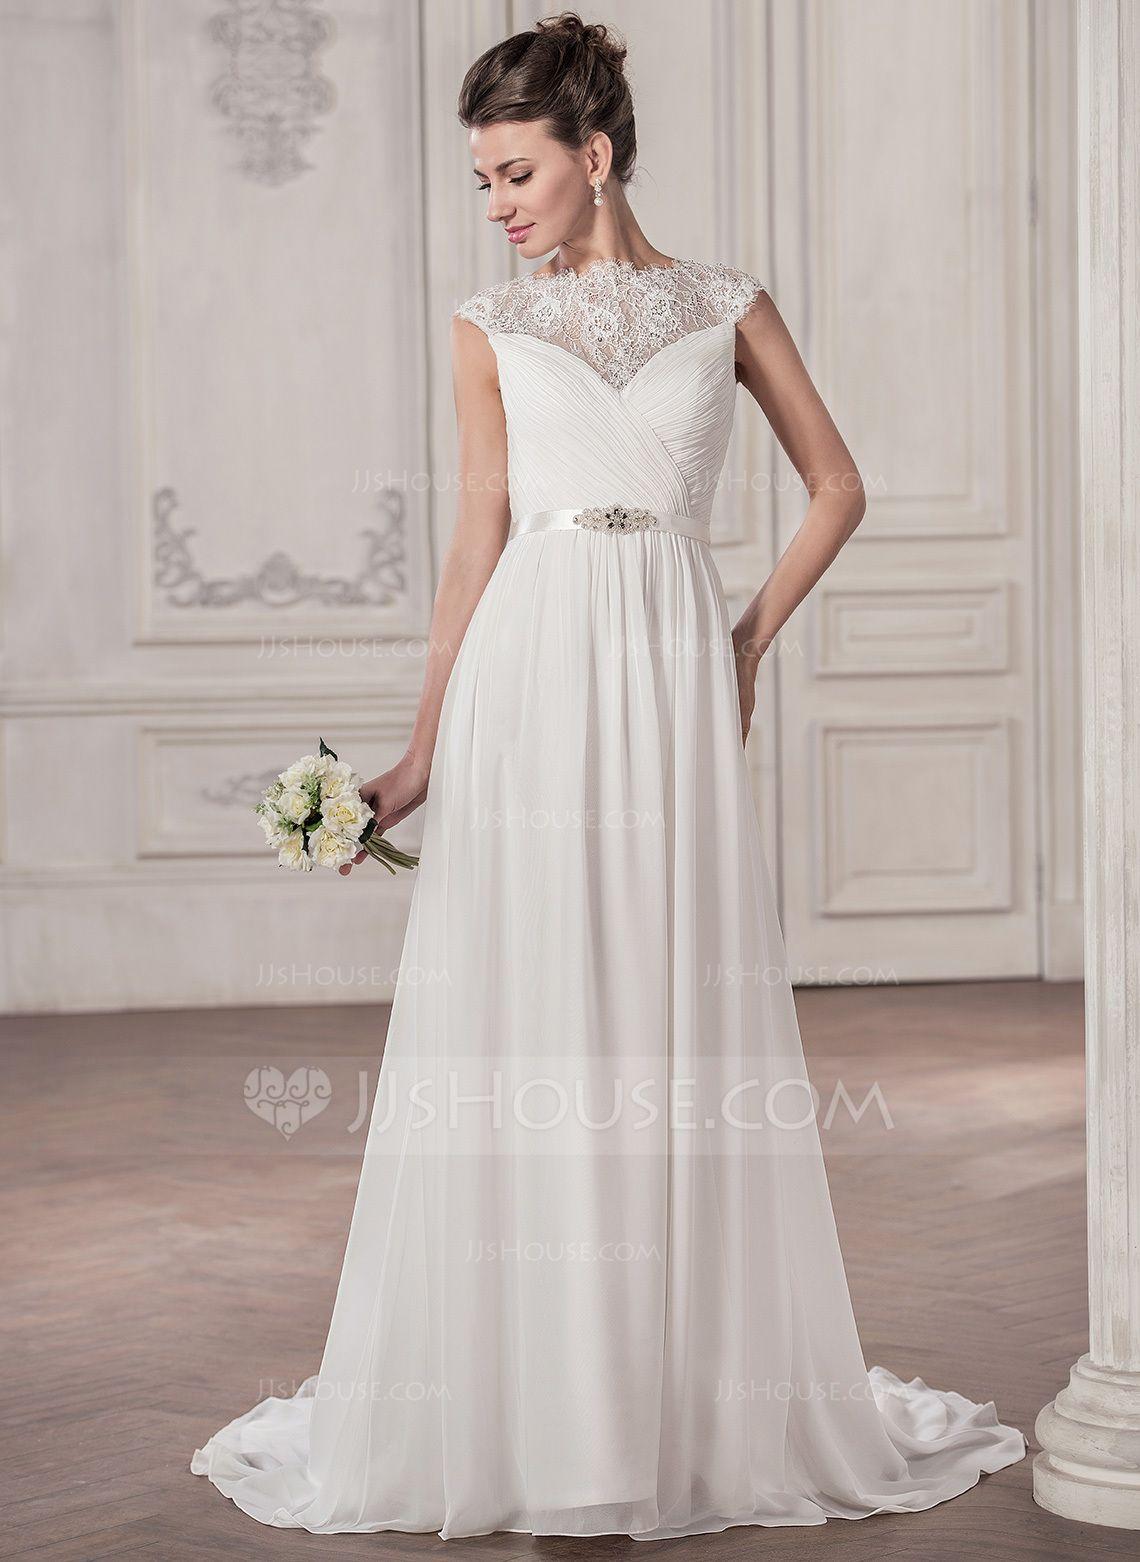 Cheap Wedding Dresses Under 18 Dollars